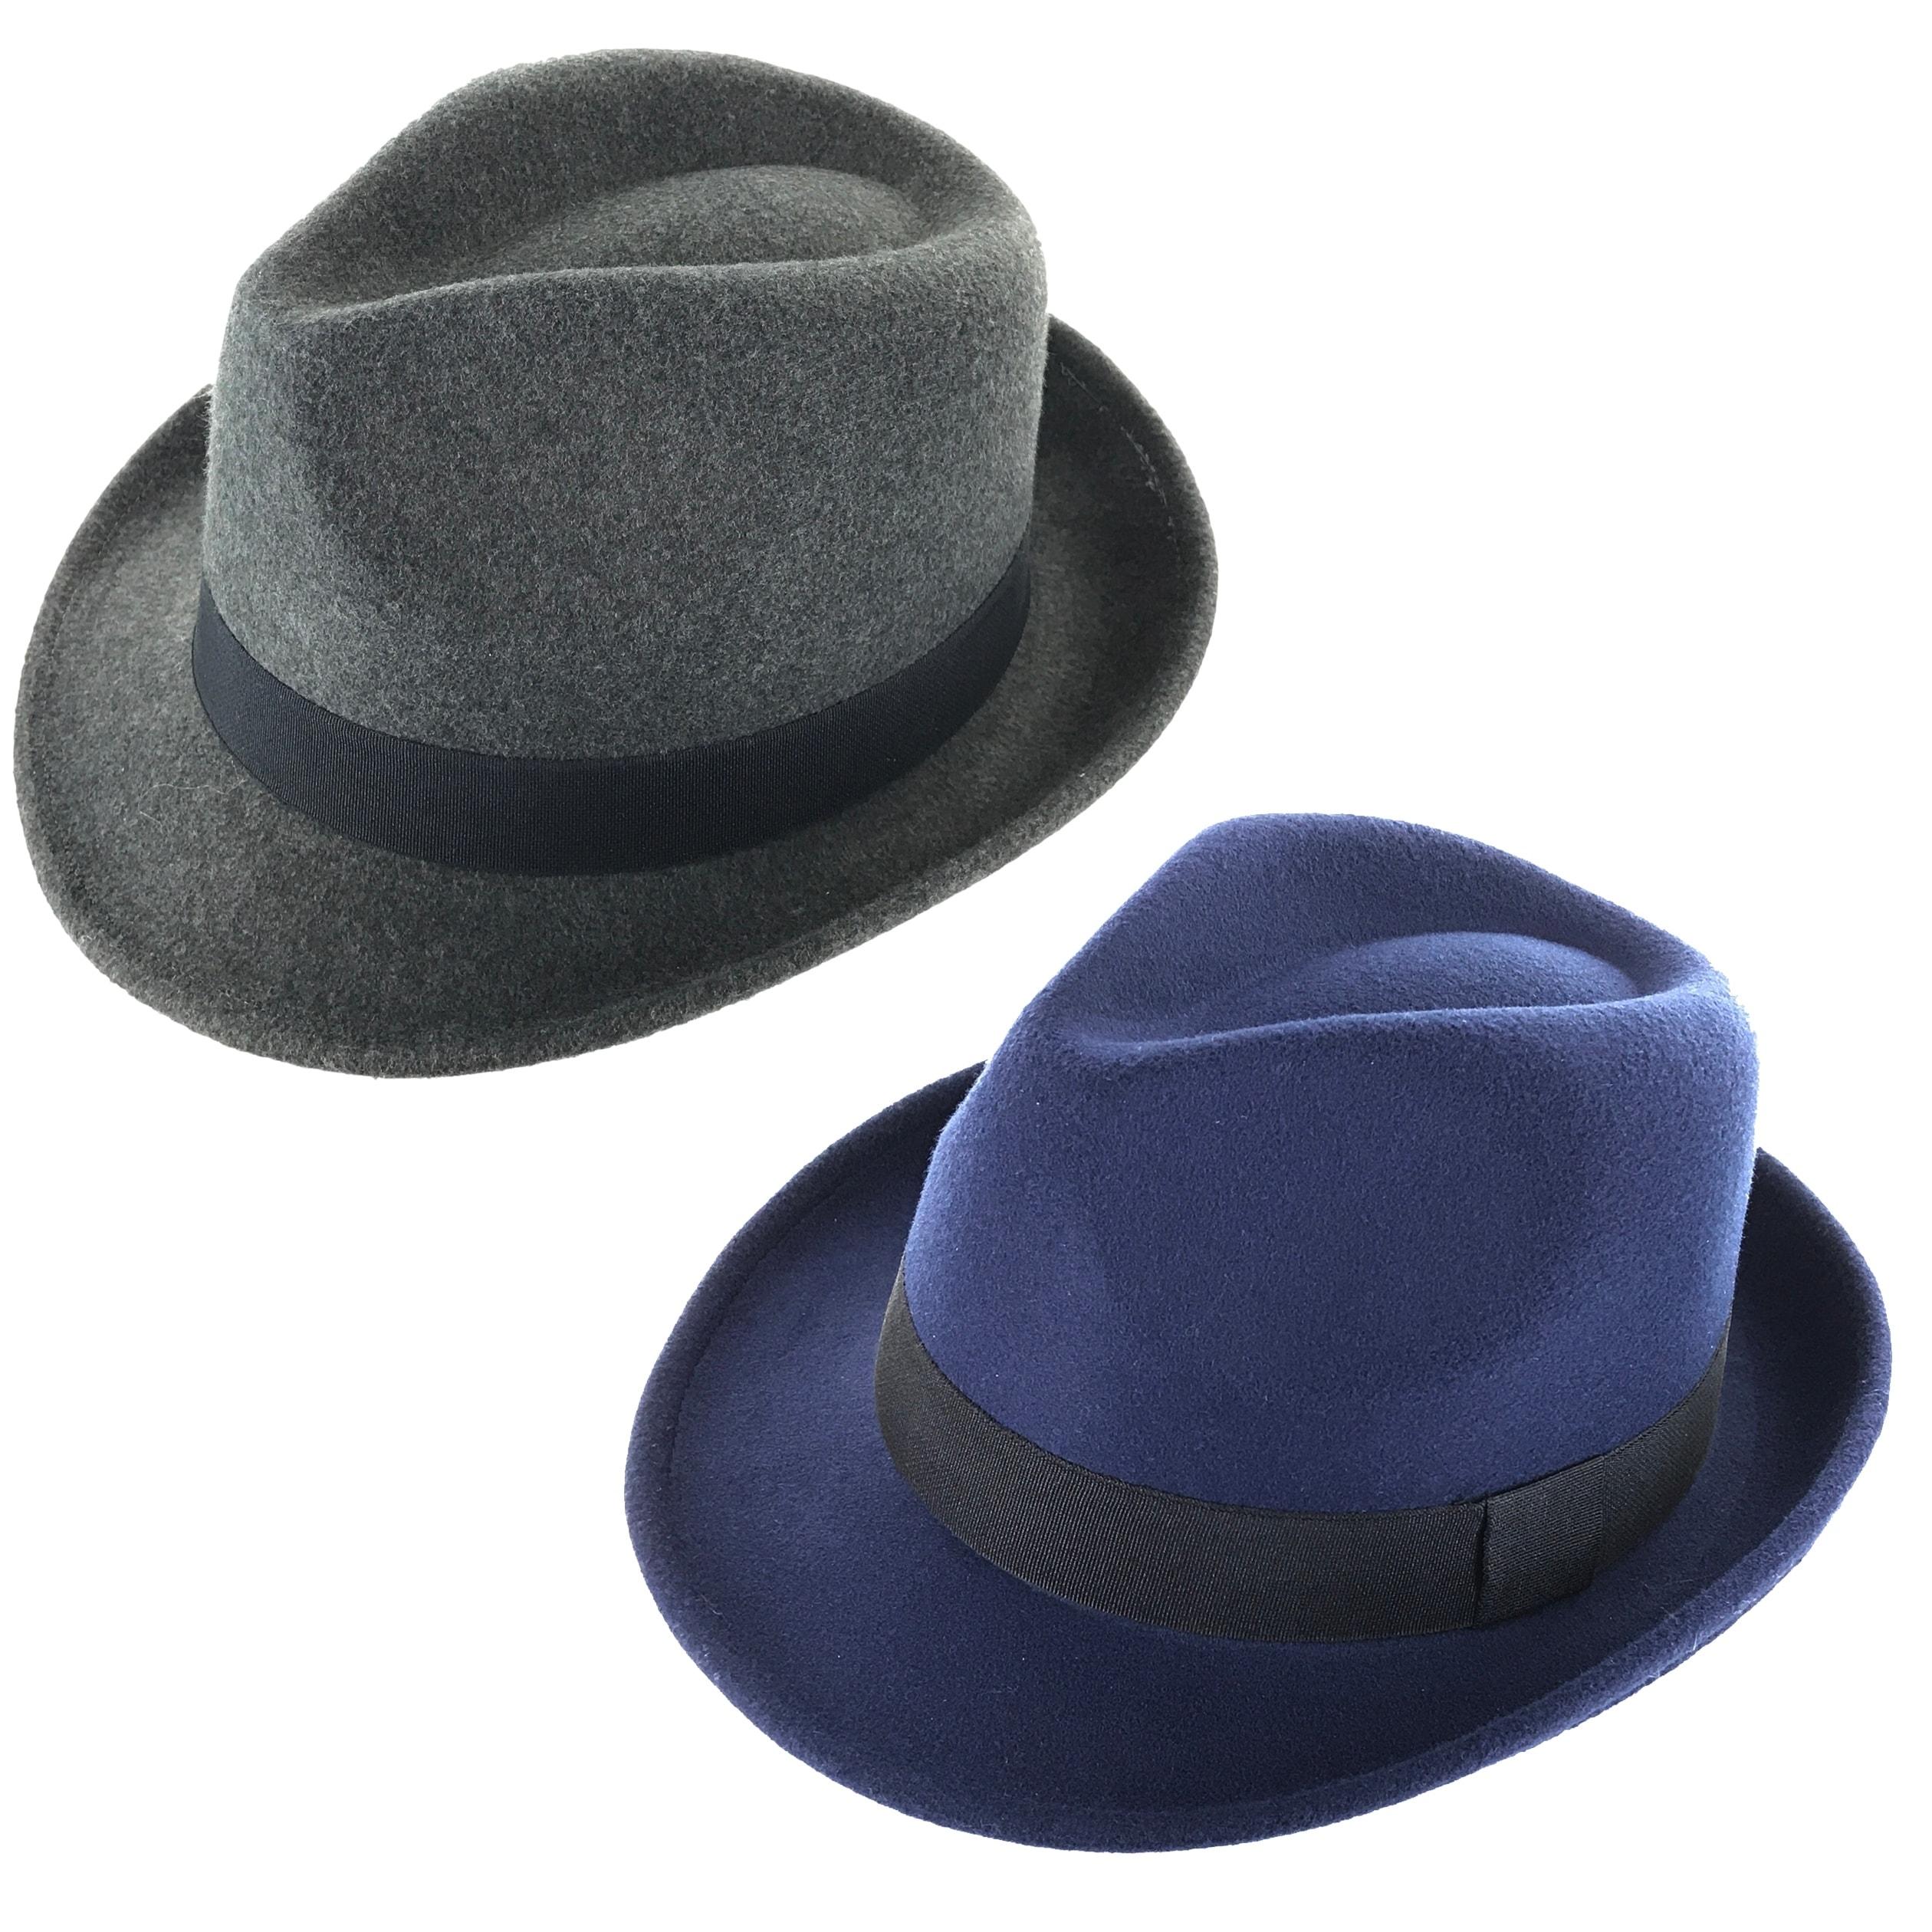 Shop Faddism Classic Velvet Cuban Style Short Brim Fedora Hat - Free ... e9be0cfd122